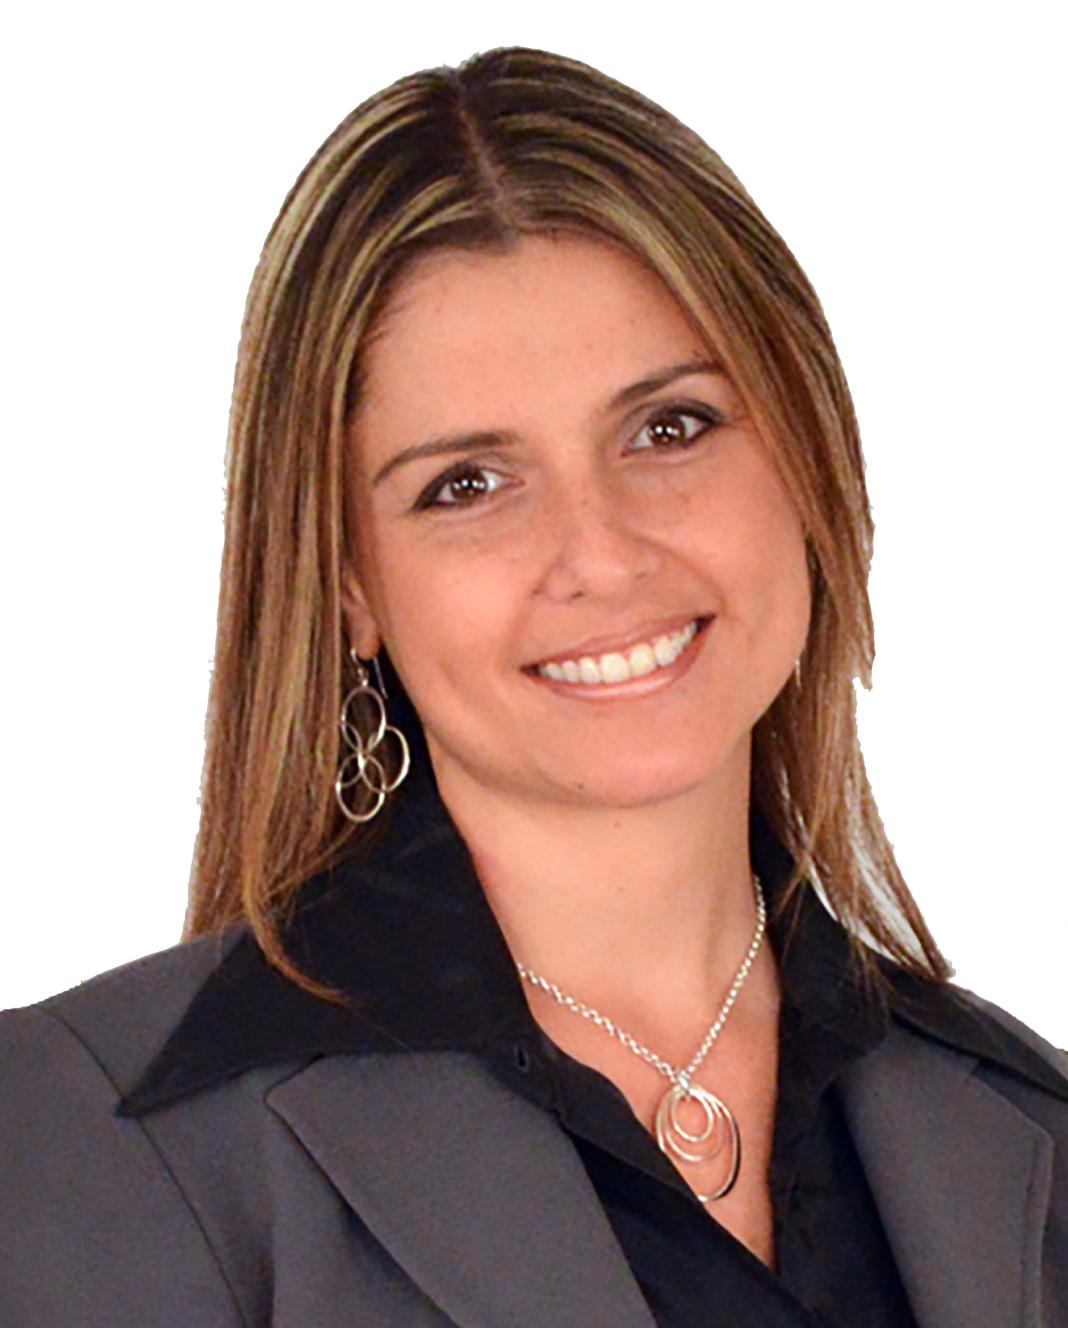 Lucelena Angarita